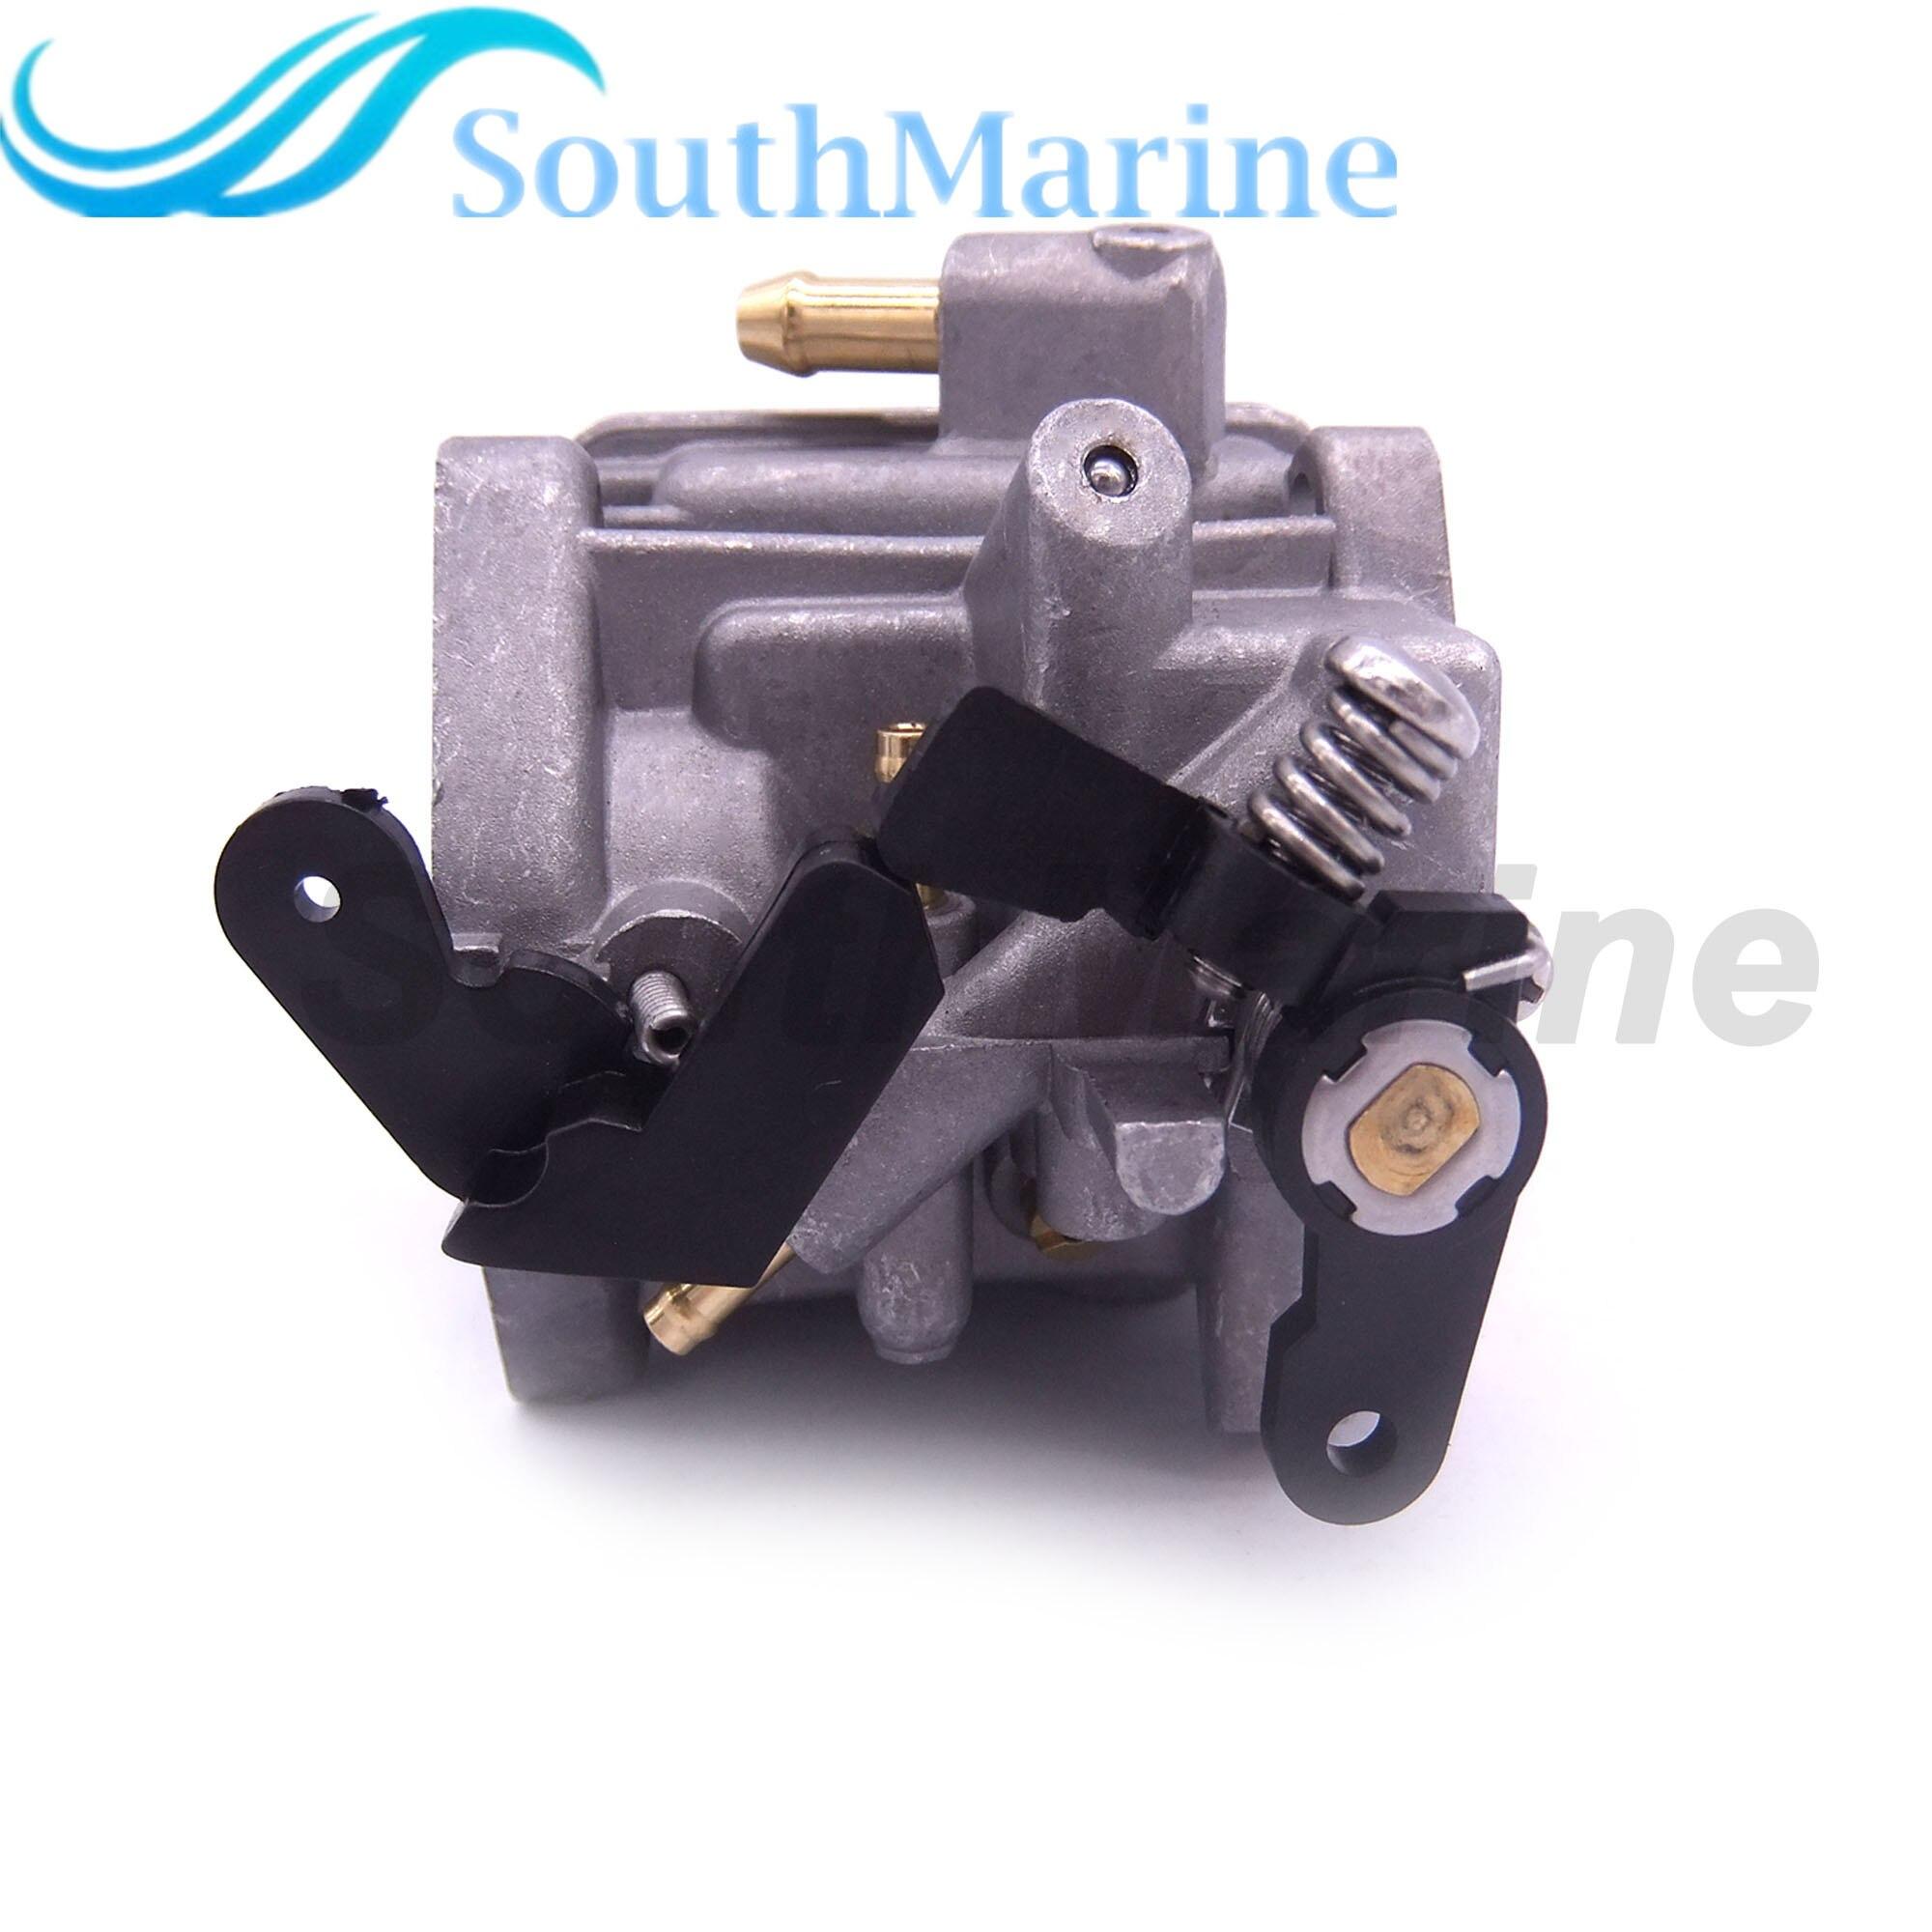 16100-ZV1-A00 16100-ZV1-A01 16100-ZV1-A02 16100-ZV1-A03 Assy Carburador Carb para Honda Motor De Popa BC05B BF5 5HP